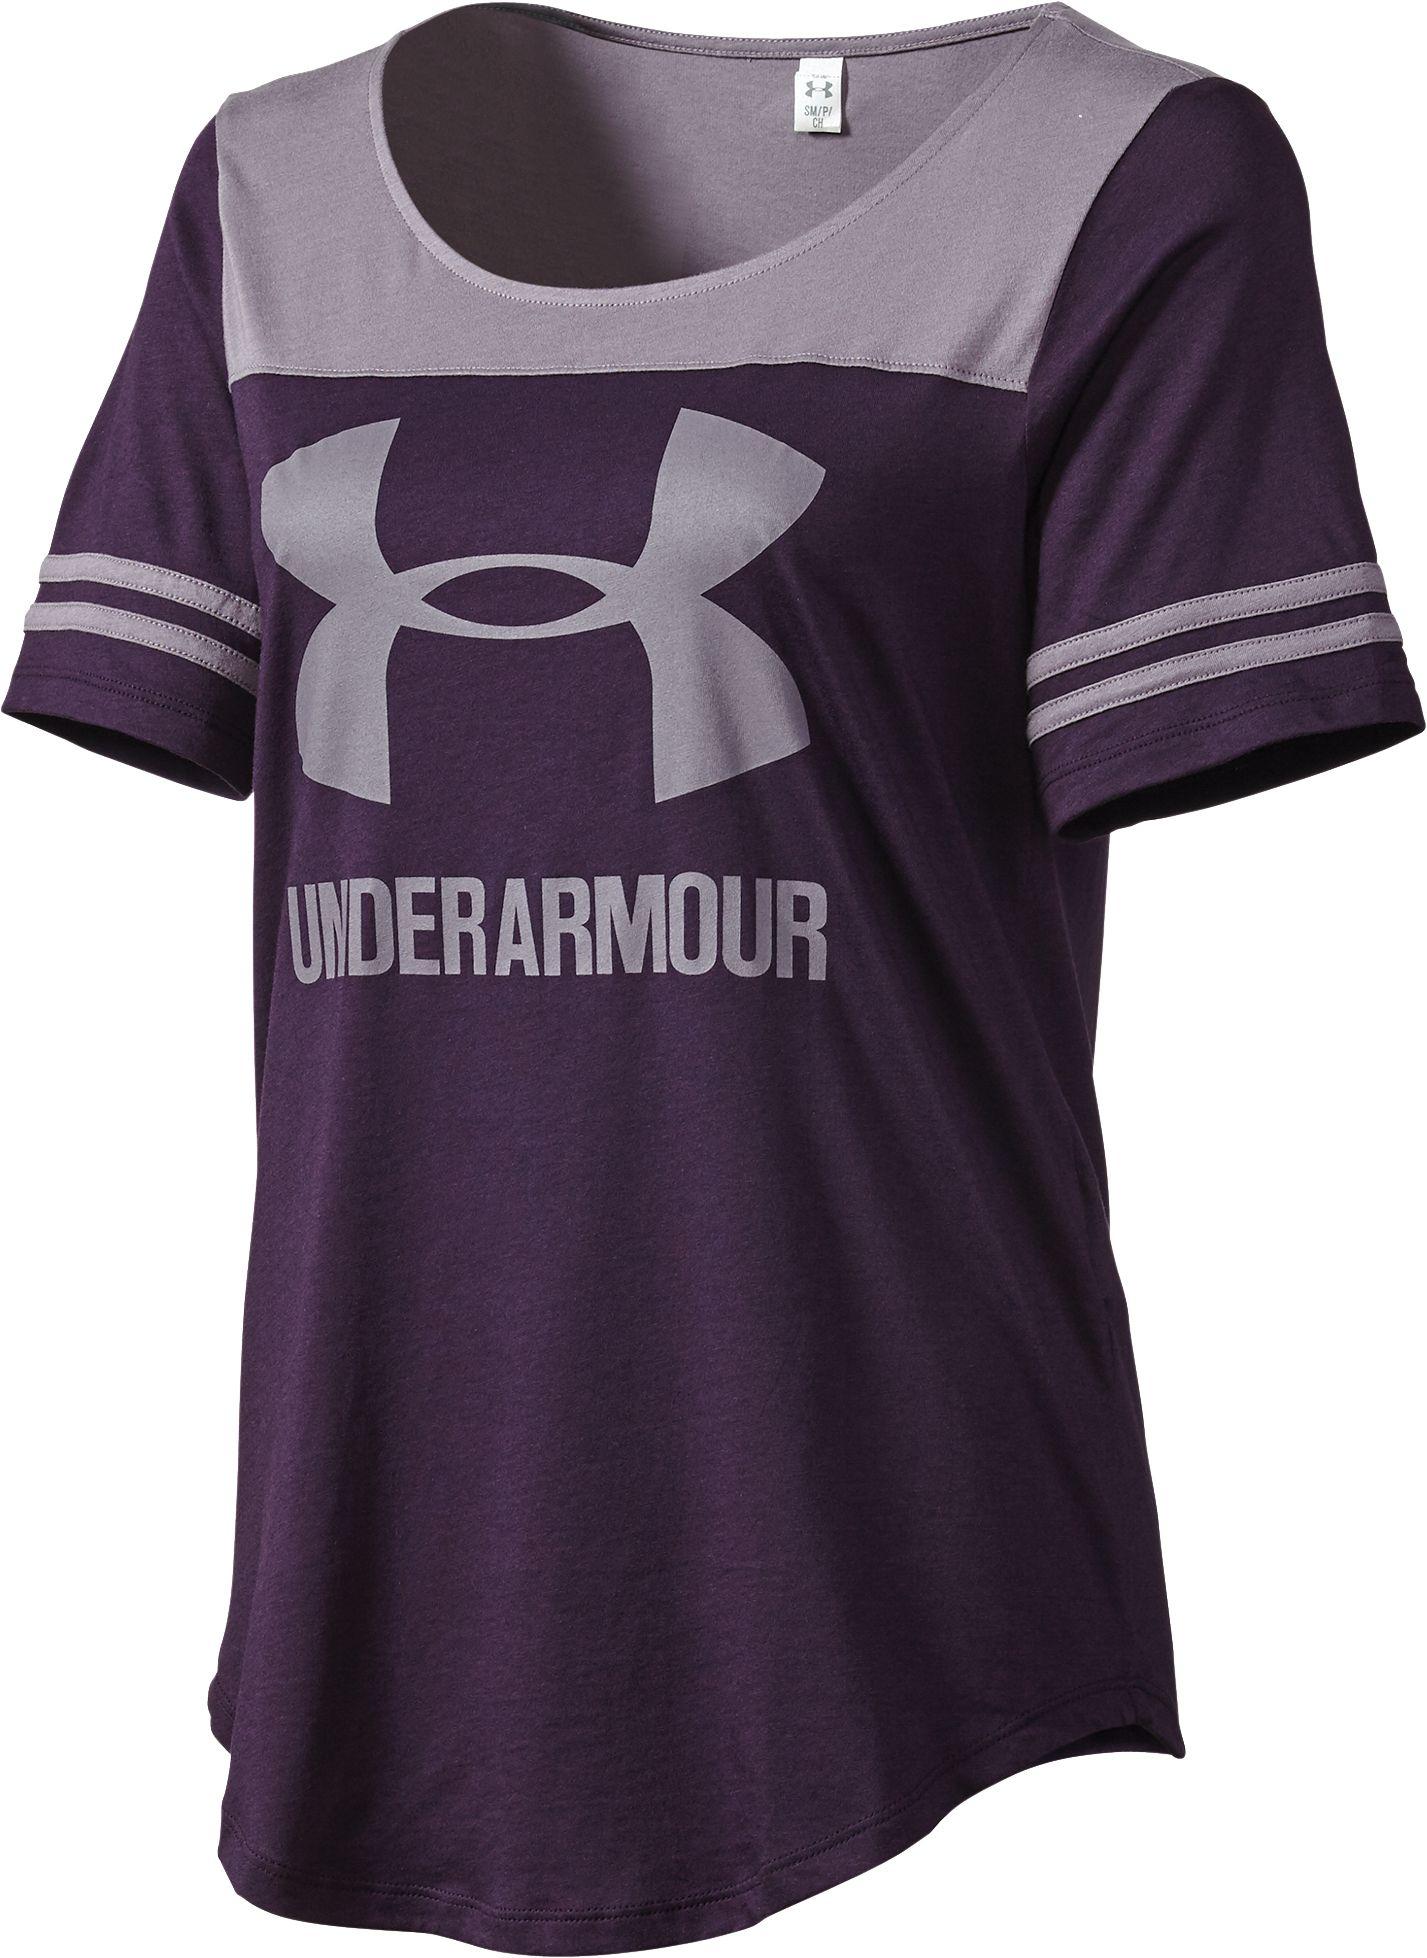 College Baseball Workout Shirts Sport Fatare